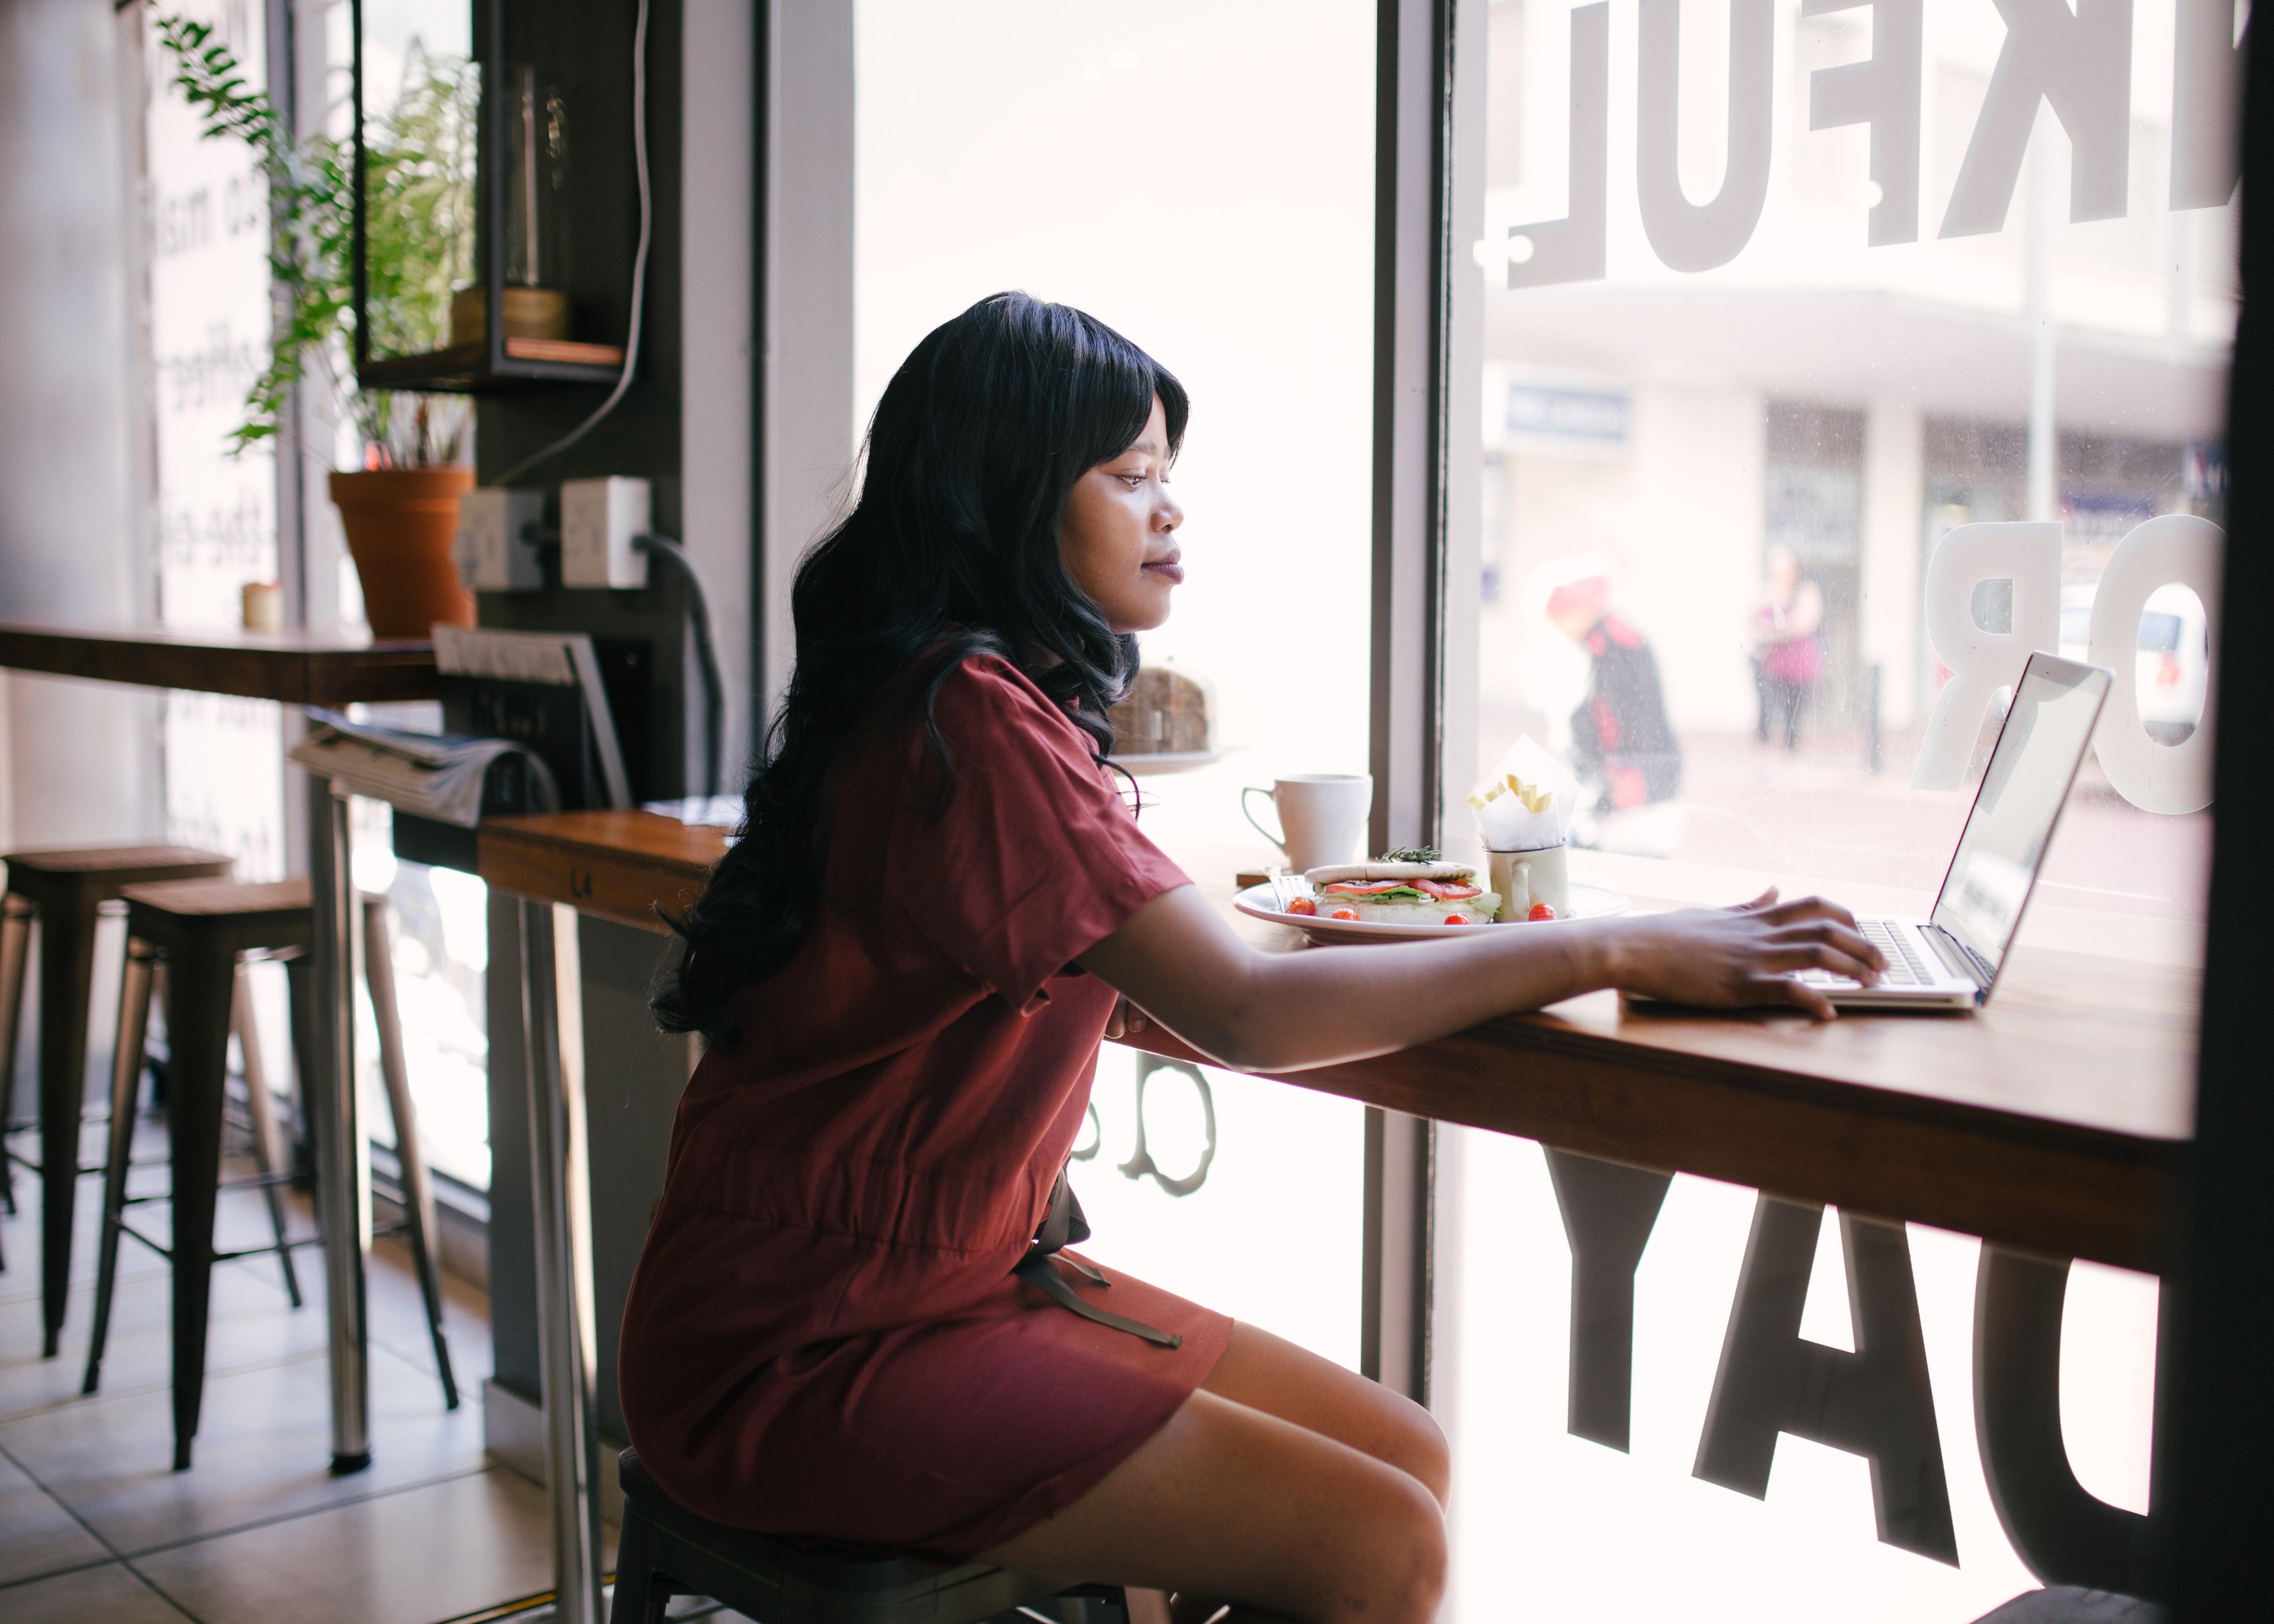 Frau arbeitet im Cafe